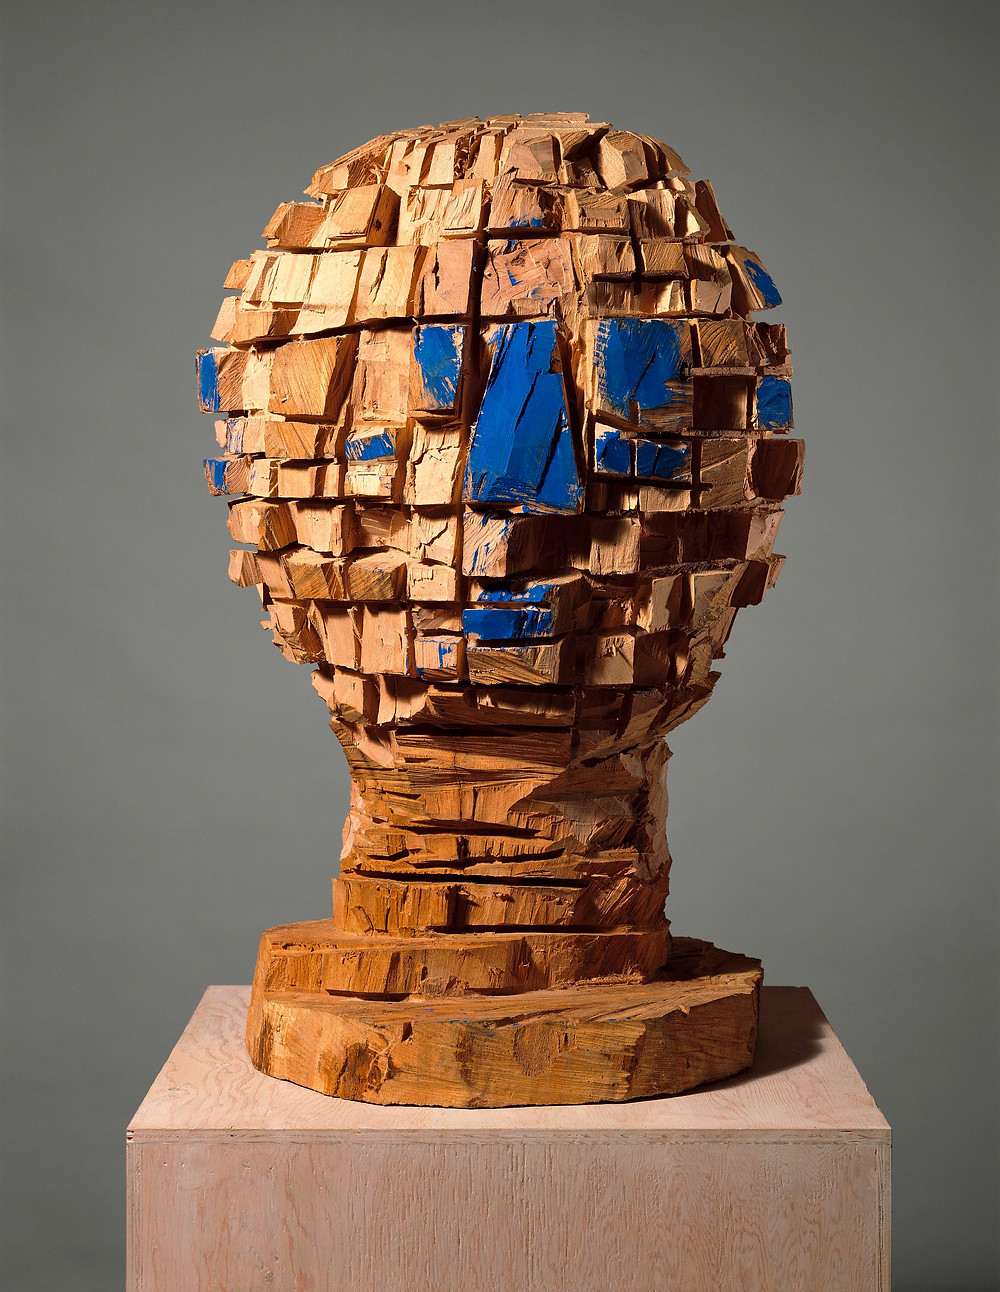 Georg Baselitz: G-fej, 1987. Olaj, bükkfa, 99 x 65,5 x 58,5 cm. Ludwig Múzeum, Budapest. Fotó: Jochen Littkemann, Berlin © Georg Baselitz